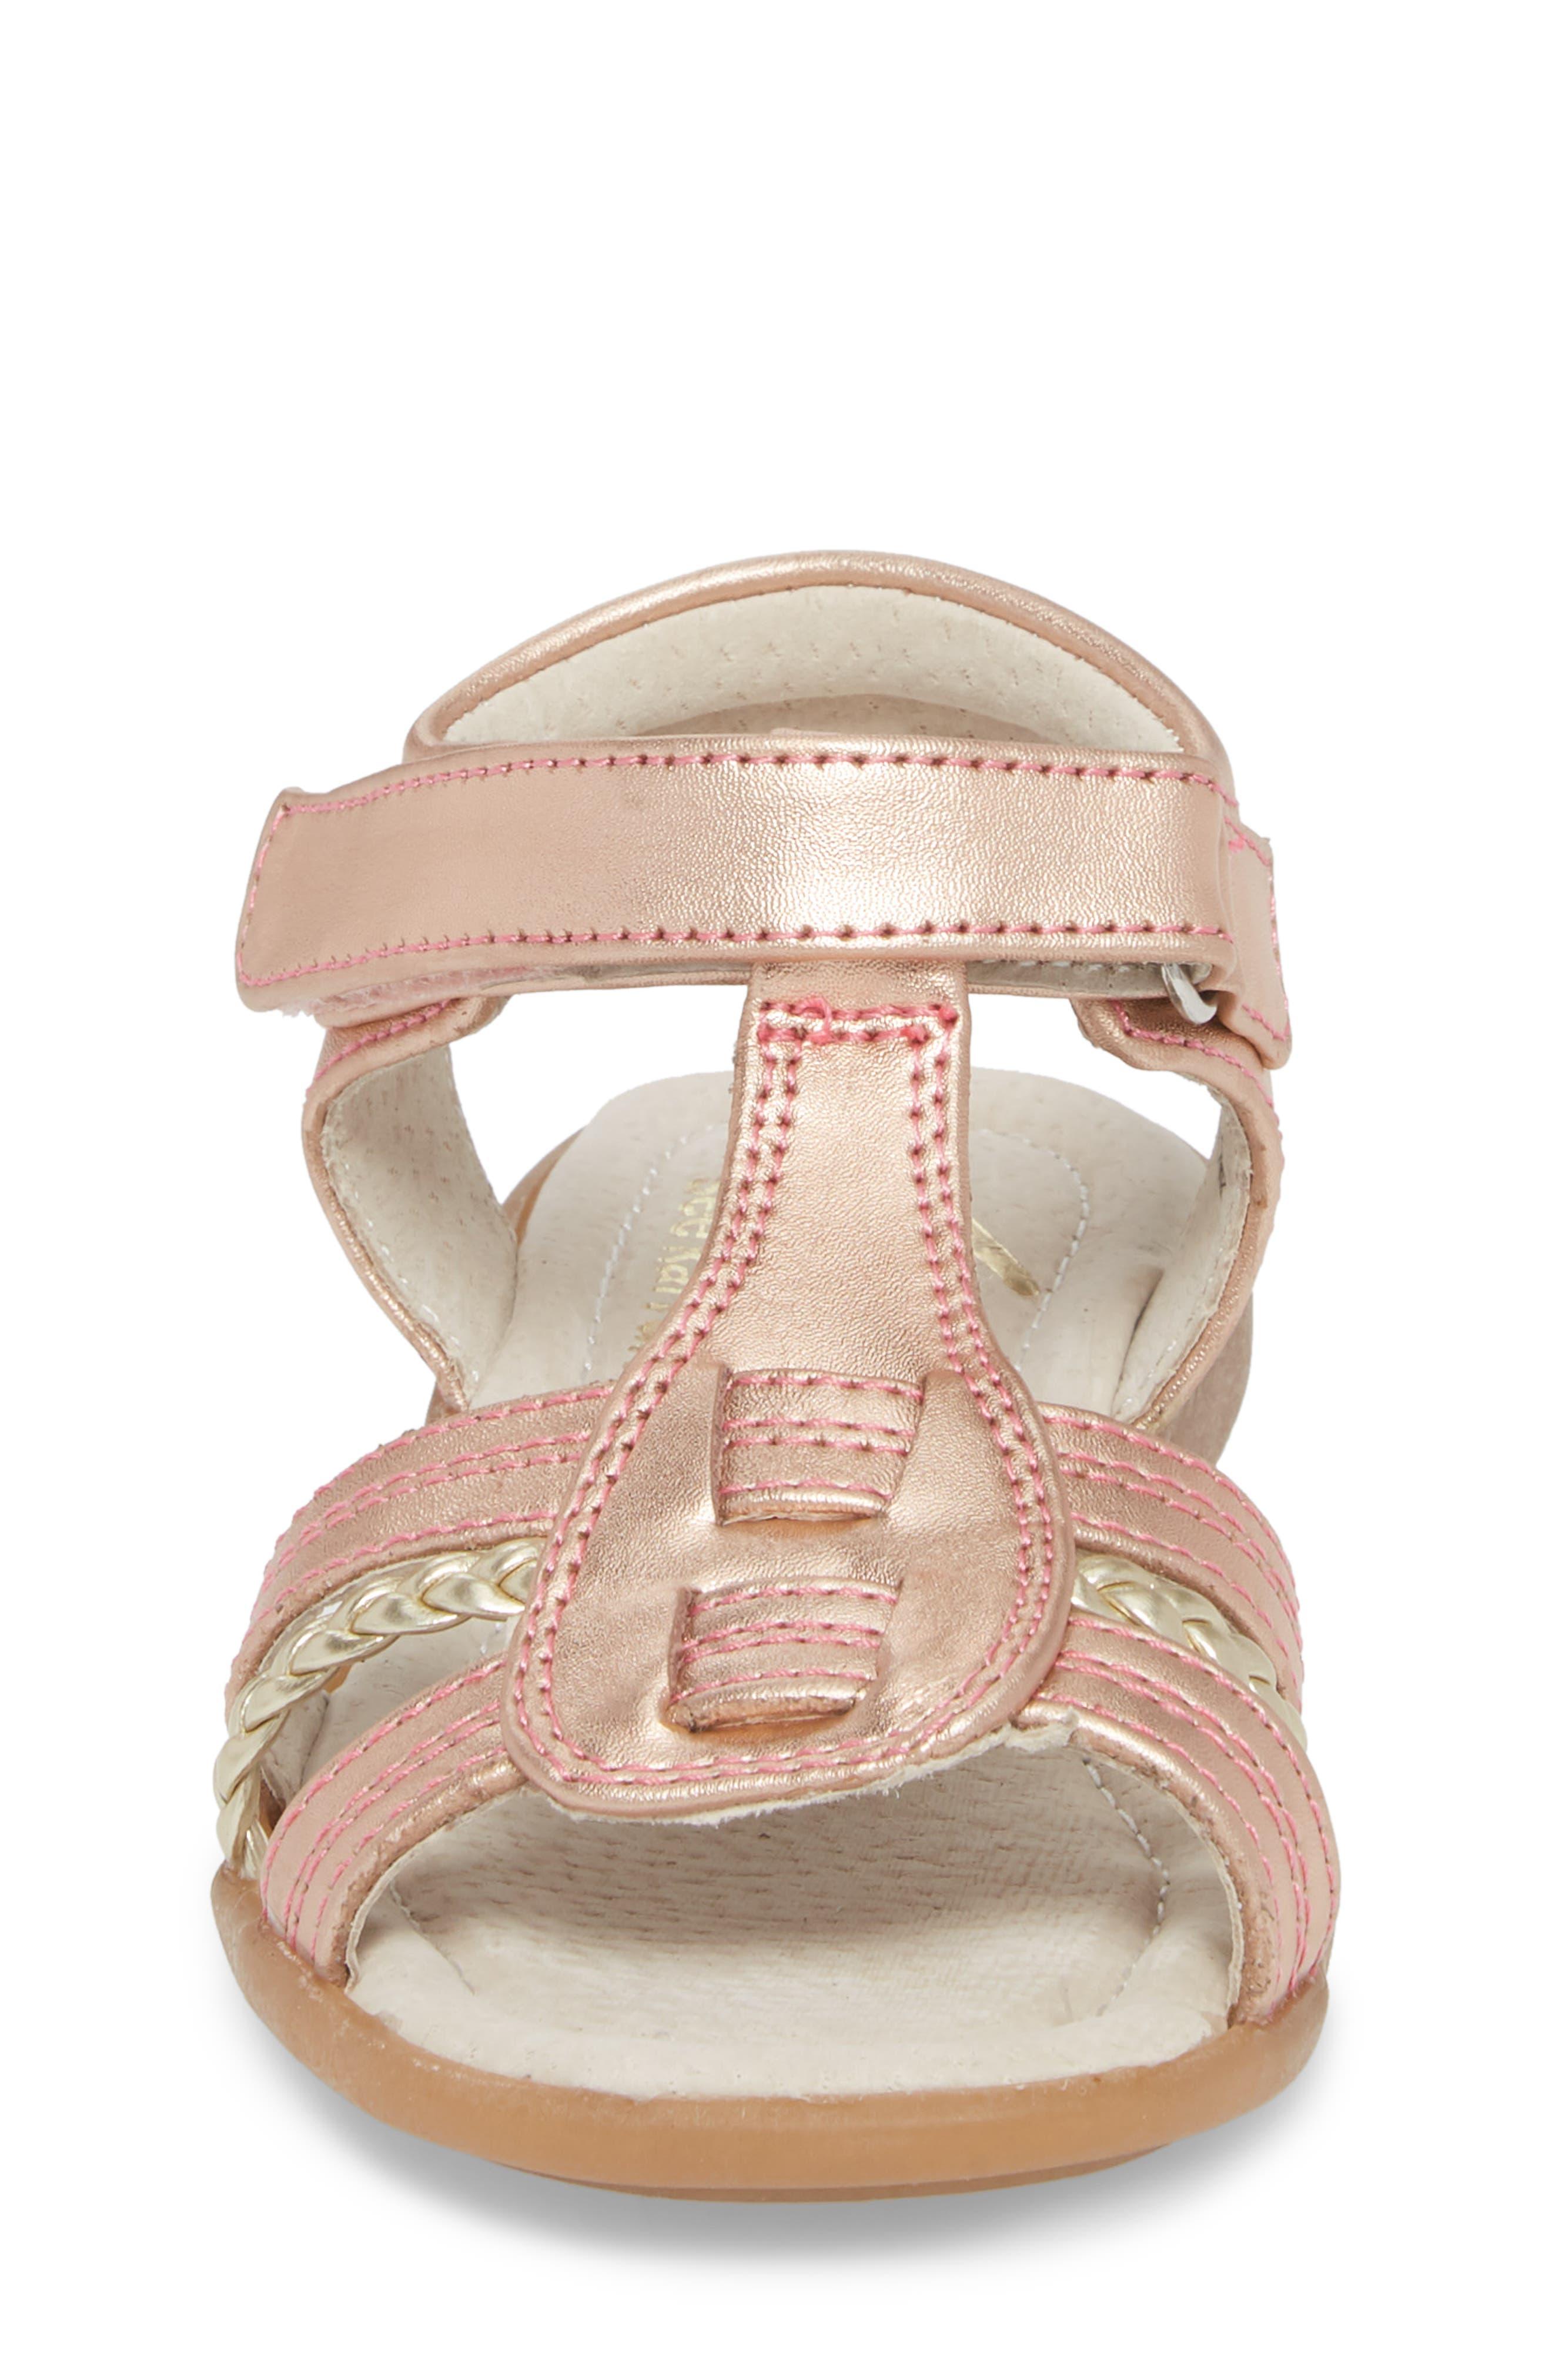 Hadley Metallic Sandal,                             Alternate thumbnail 4, color,                             Rose Gold